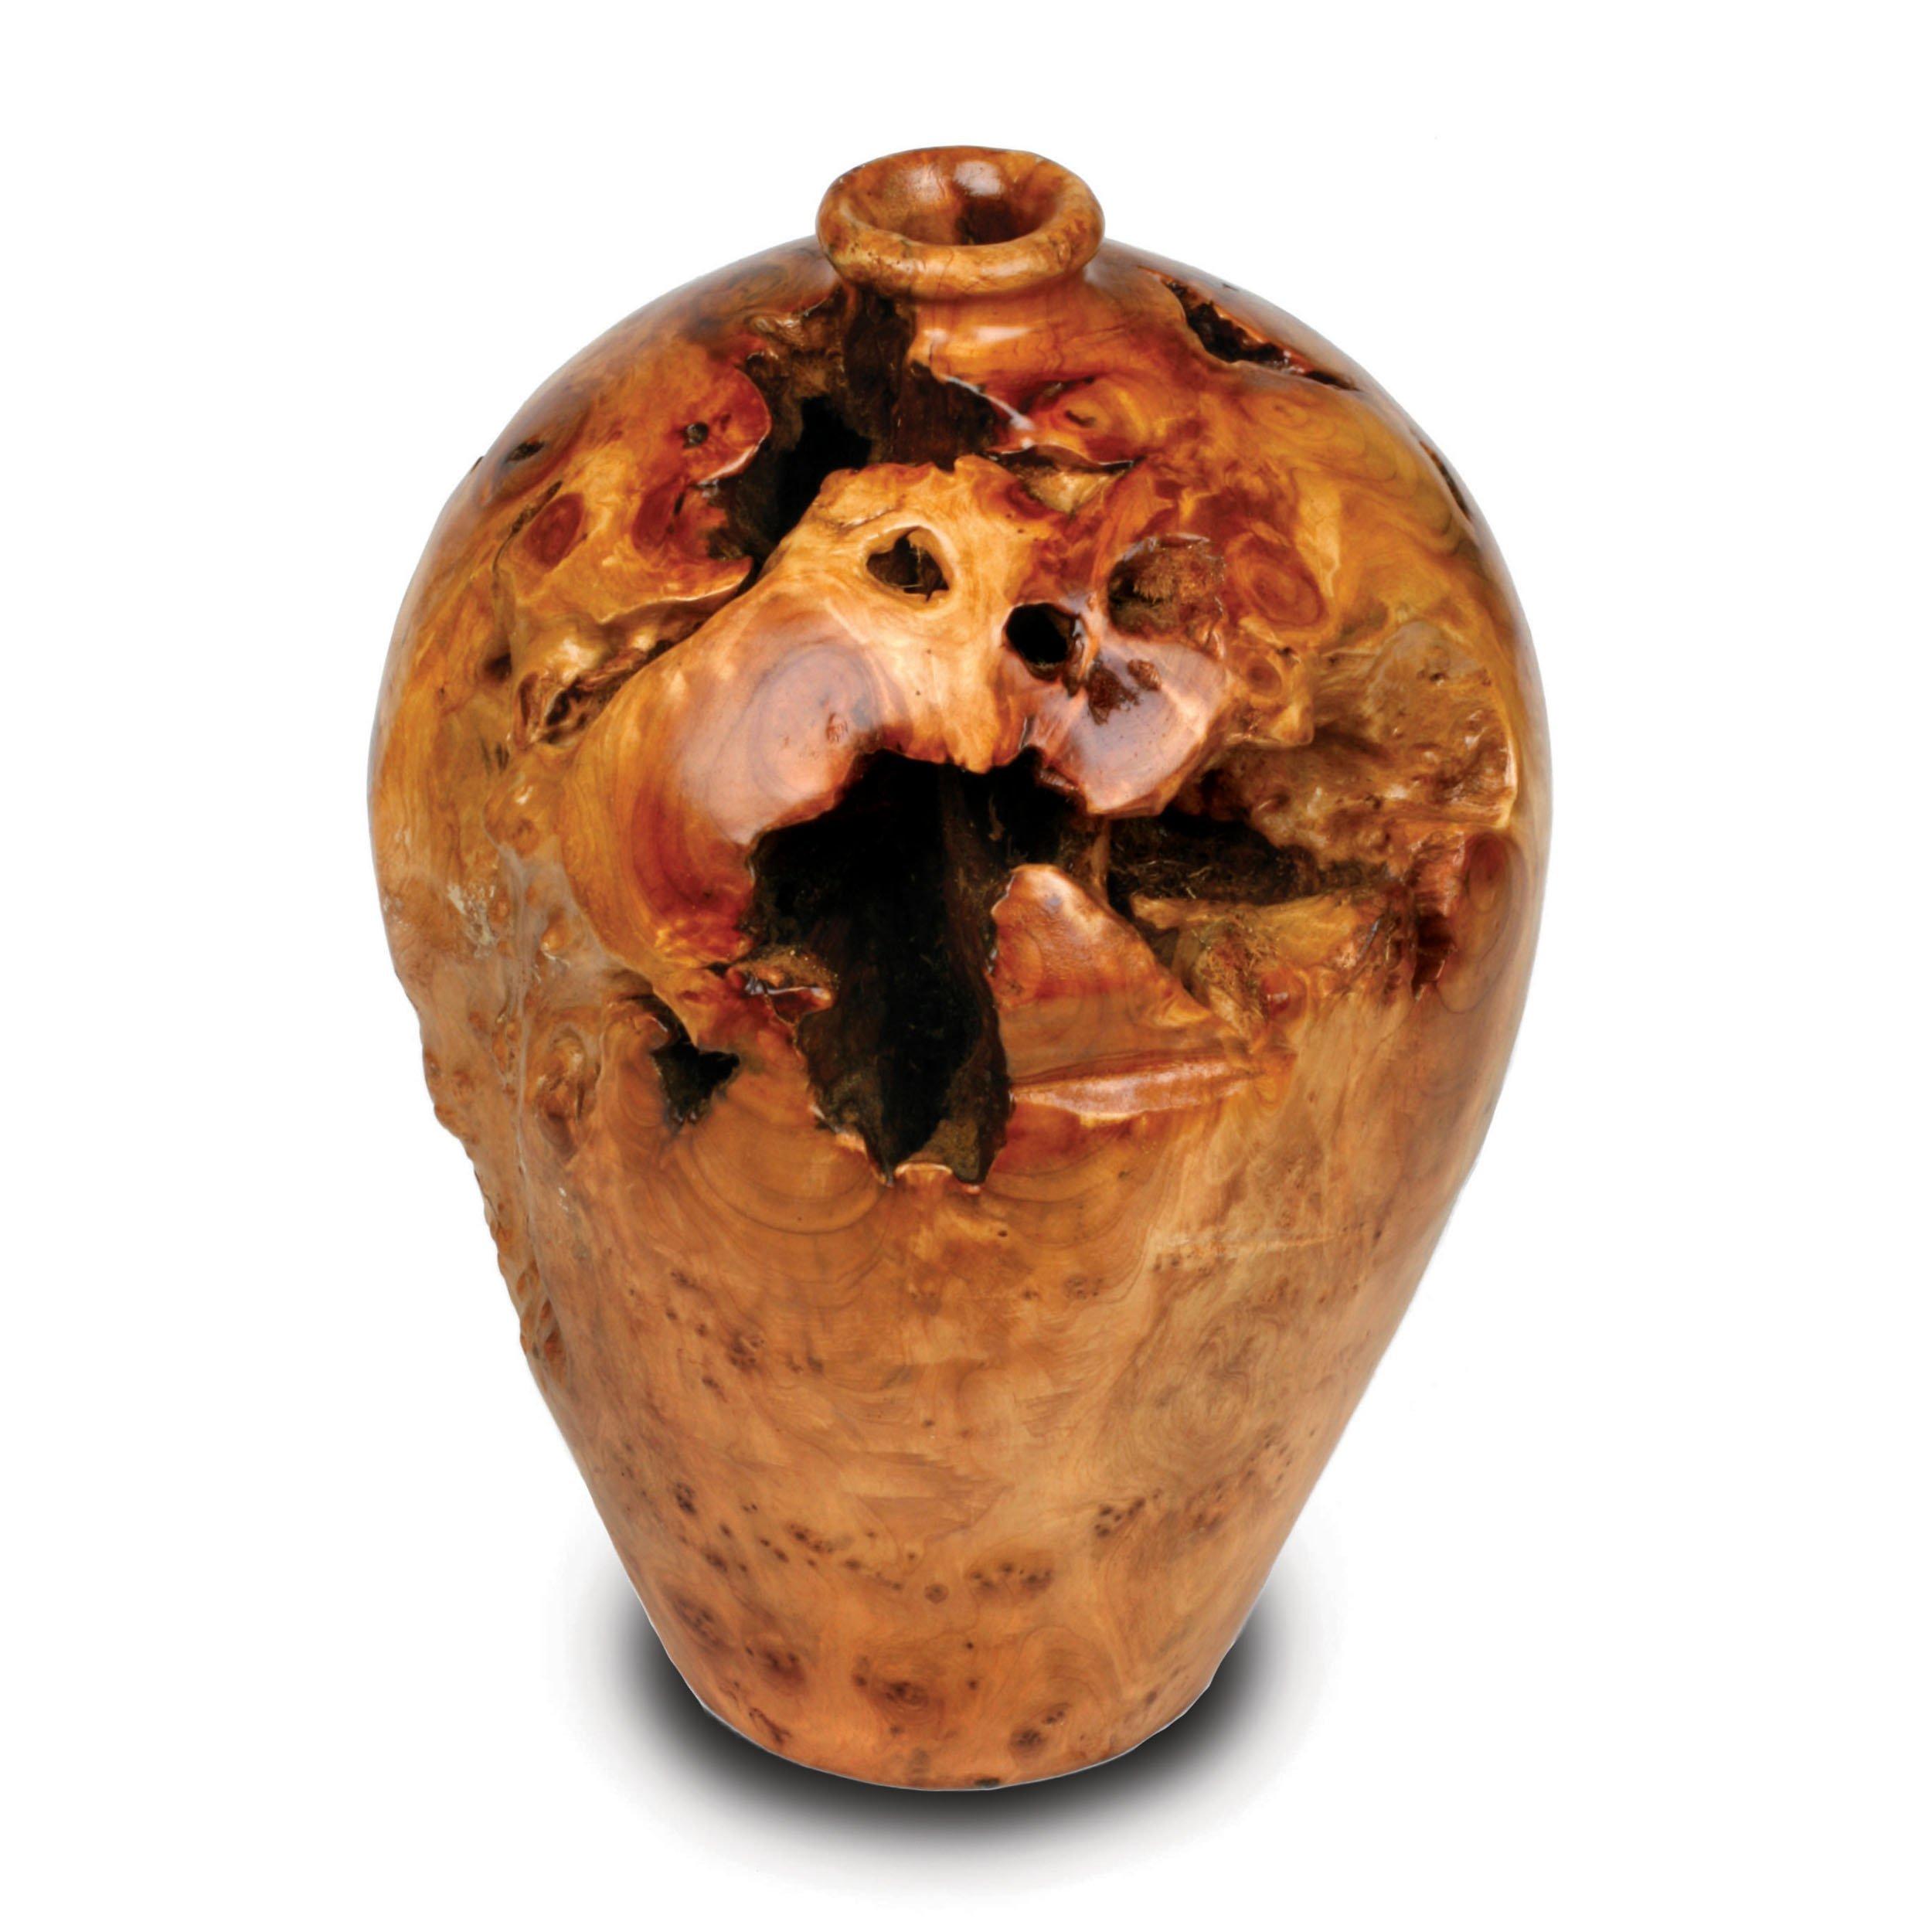 Enrico 2420 Root Wood Large Urn